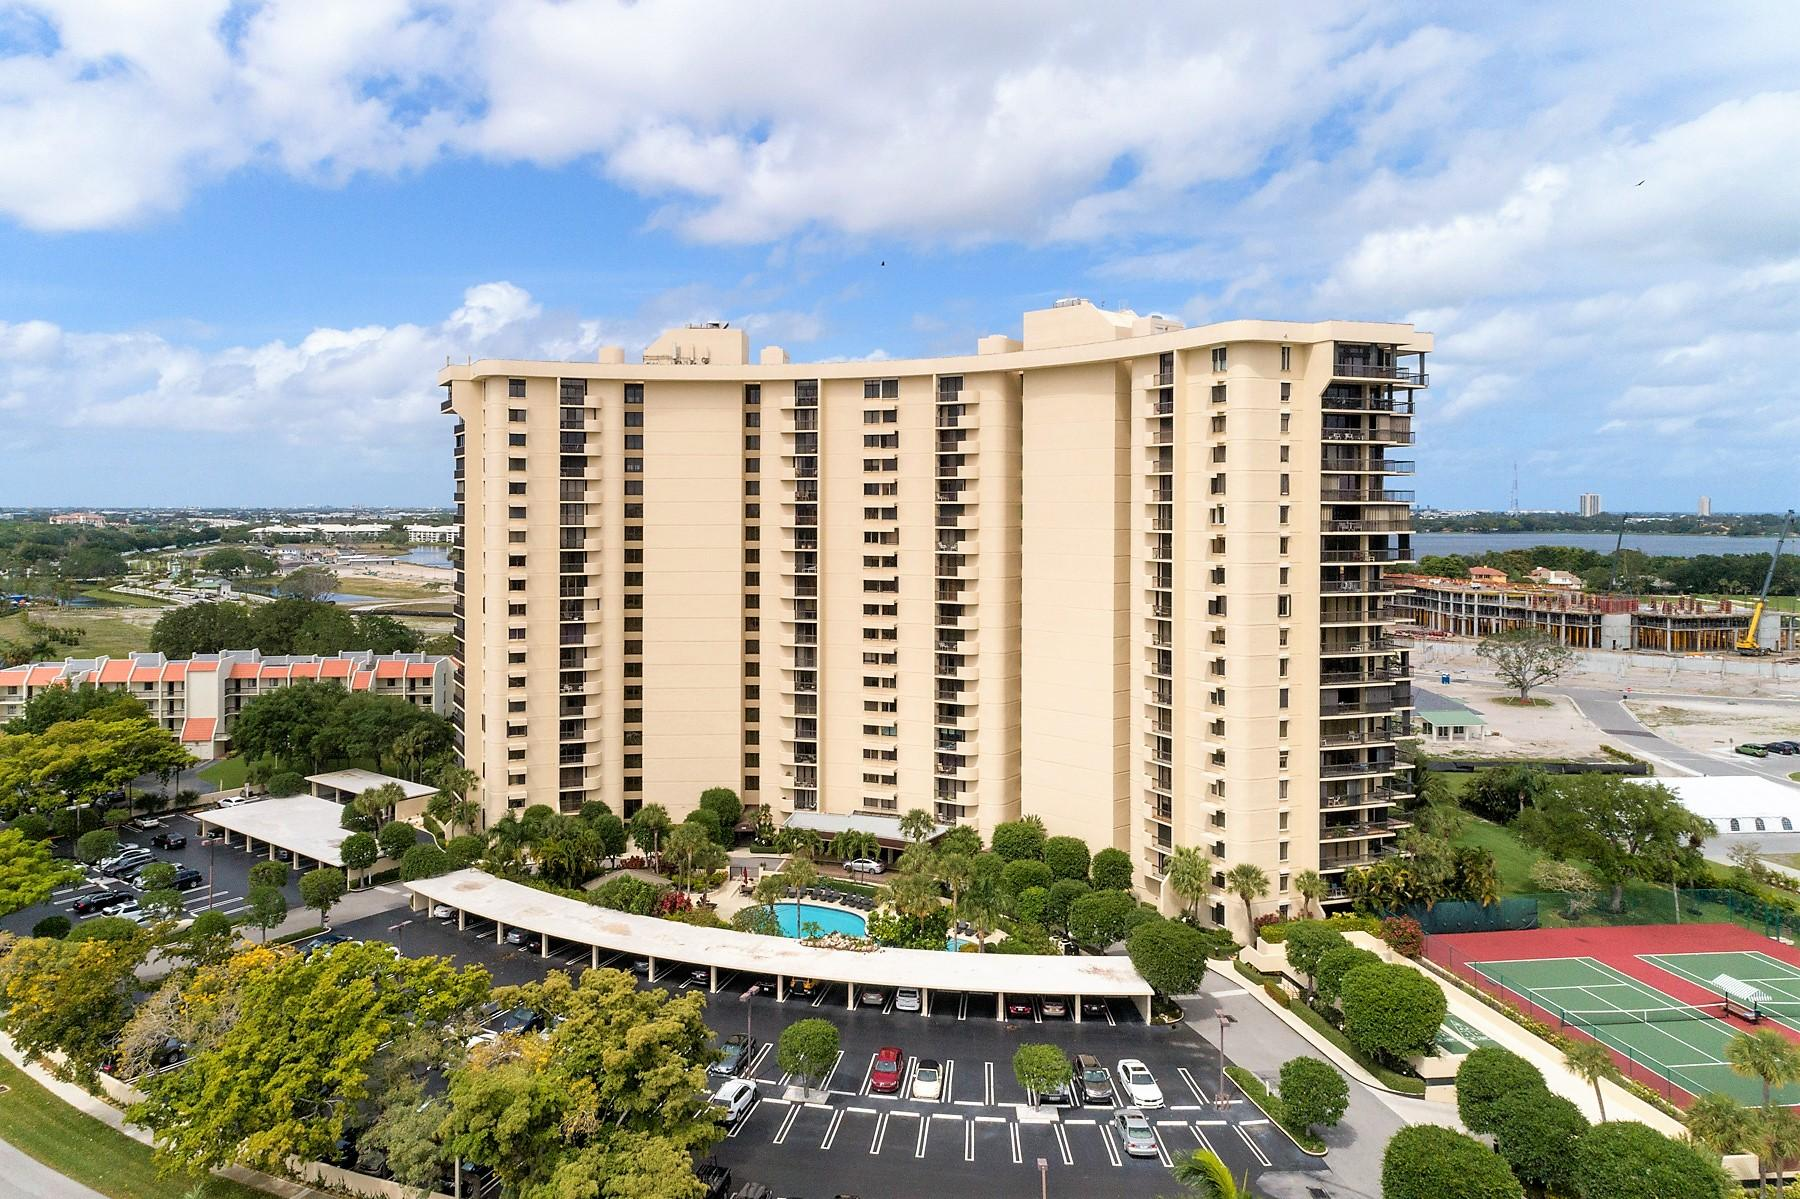 2480 Presidential Way, West Palm Beach, FL 33401